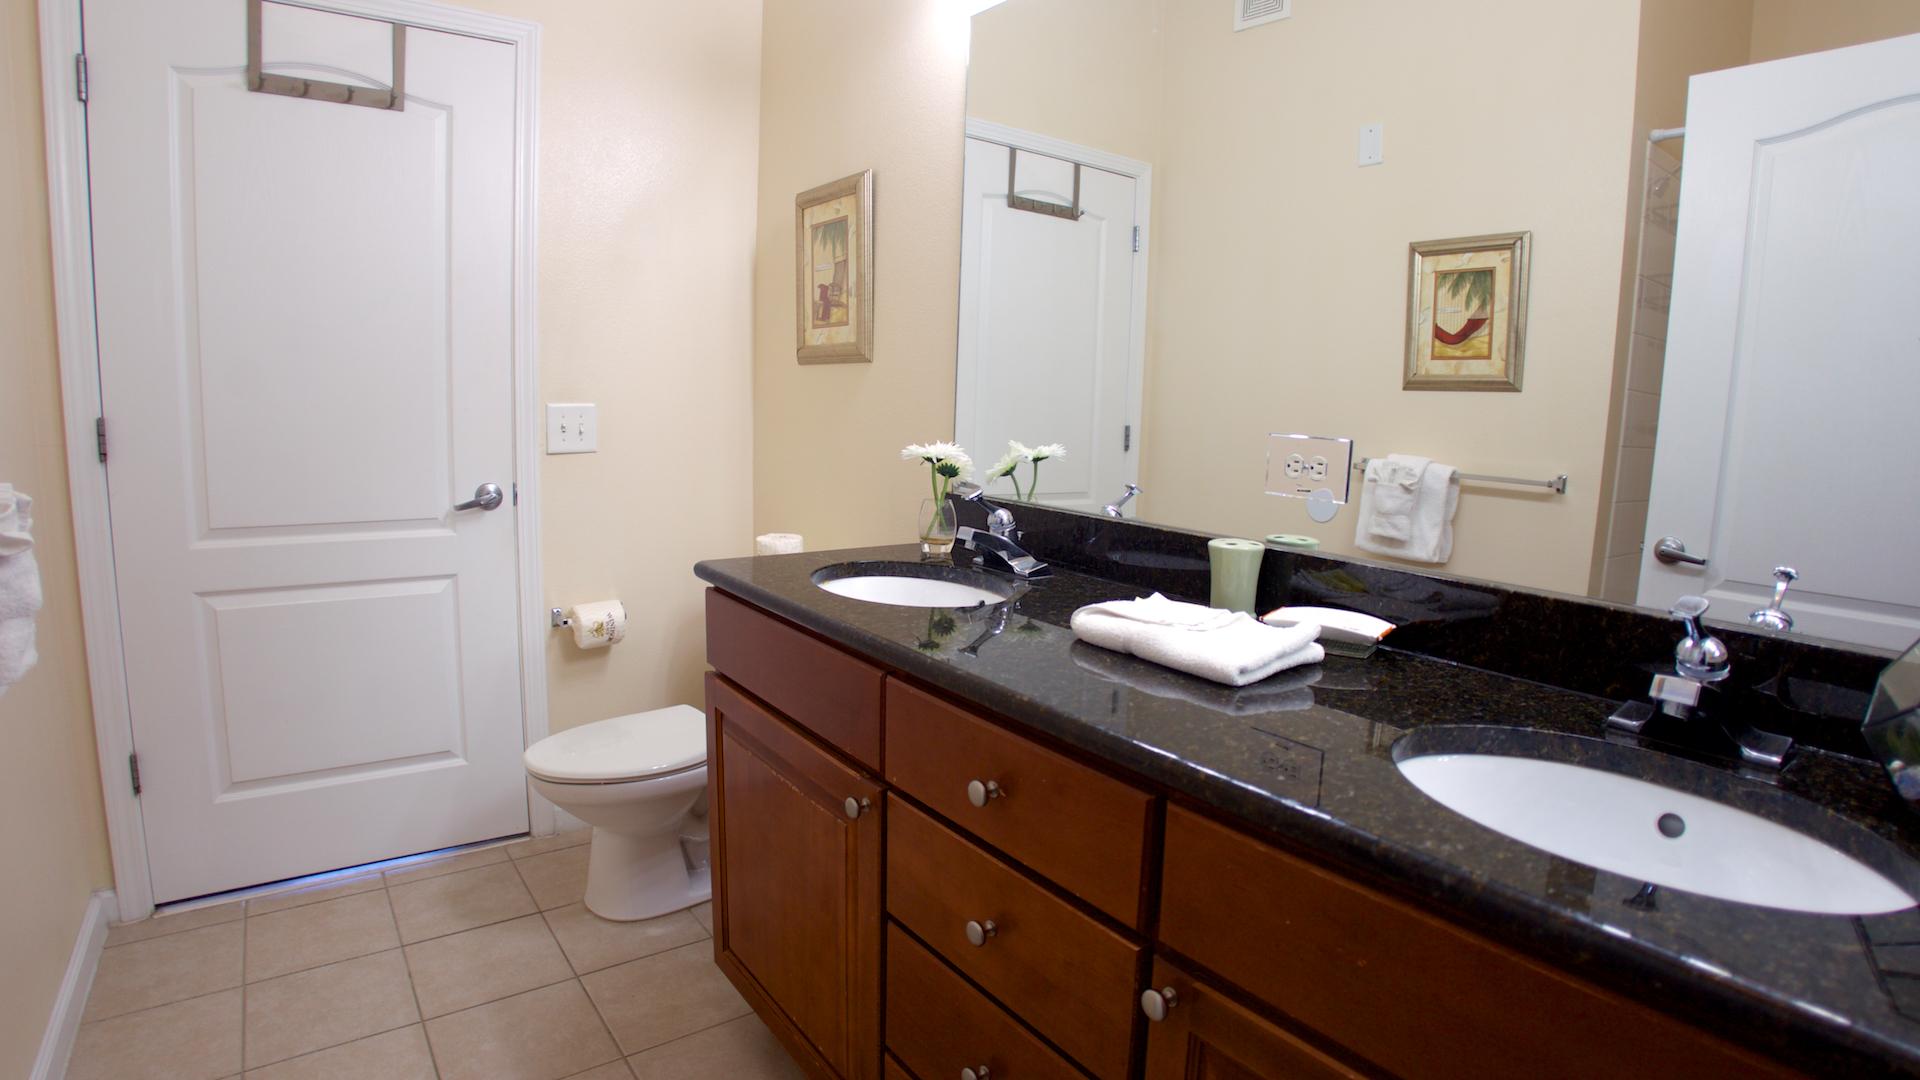 Apartment Cayman Condo at Cane Island Resort photo 20413945